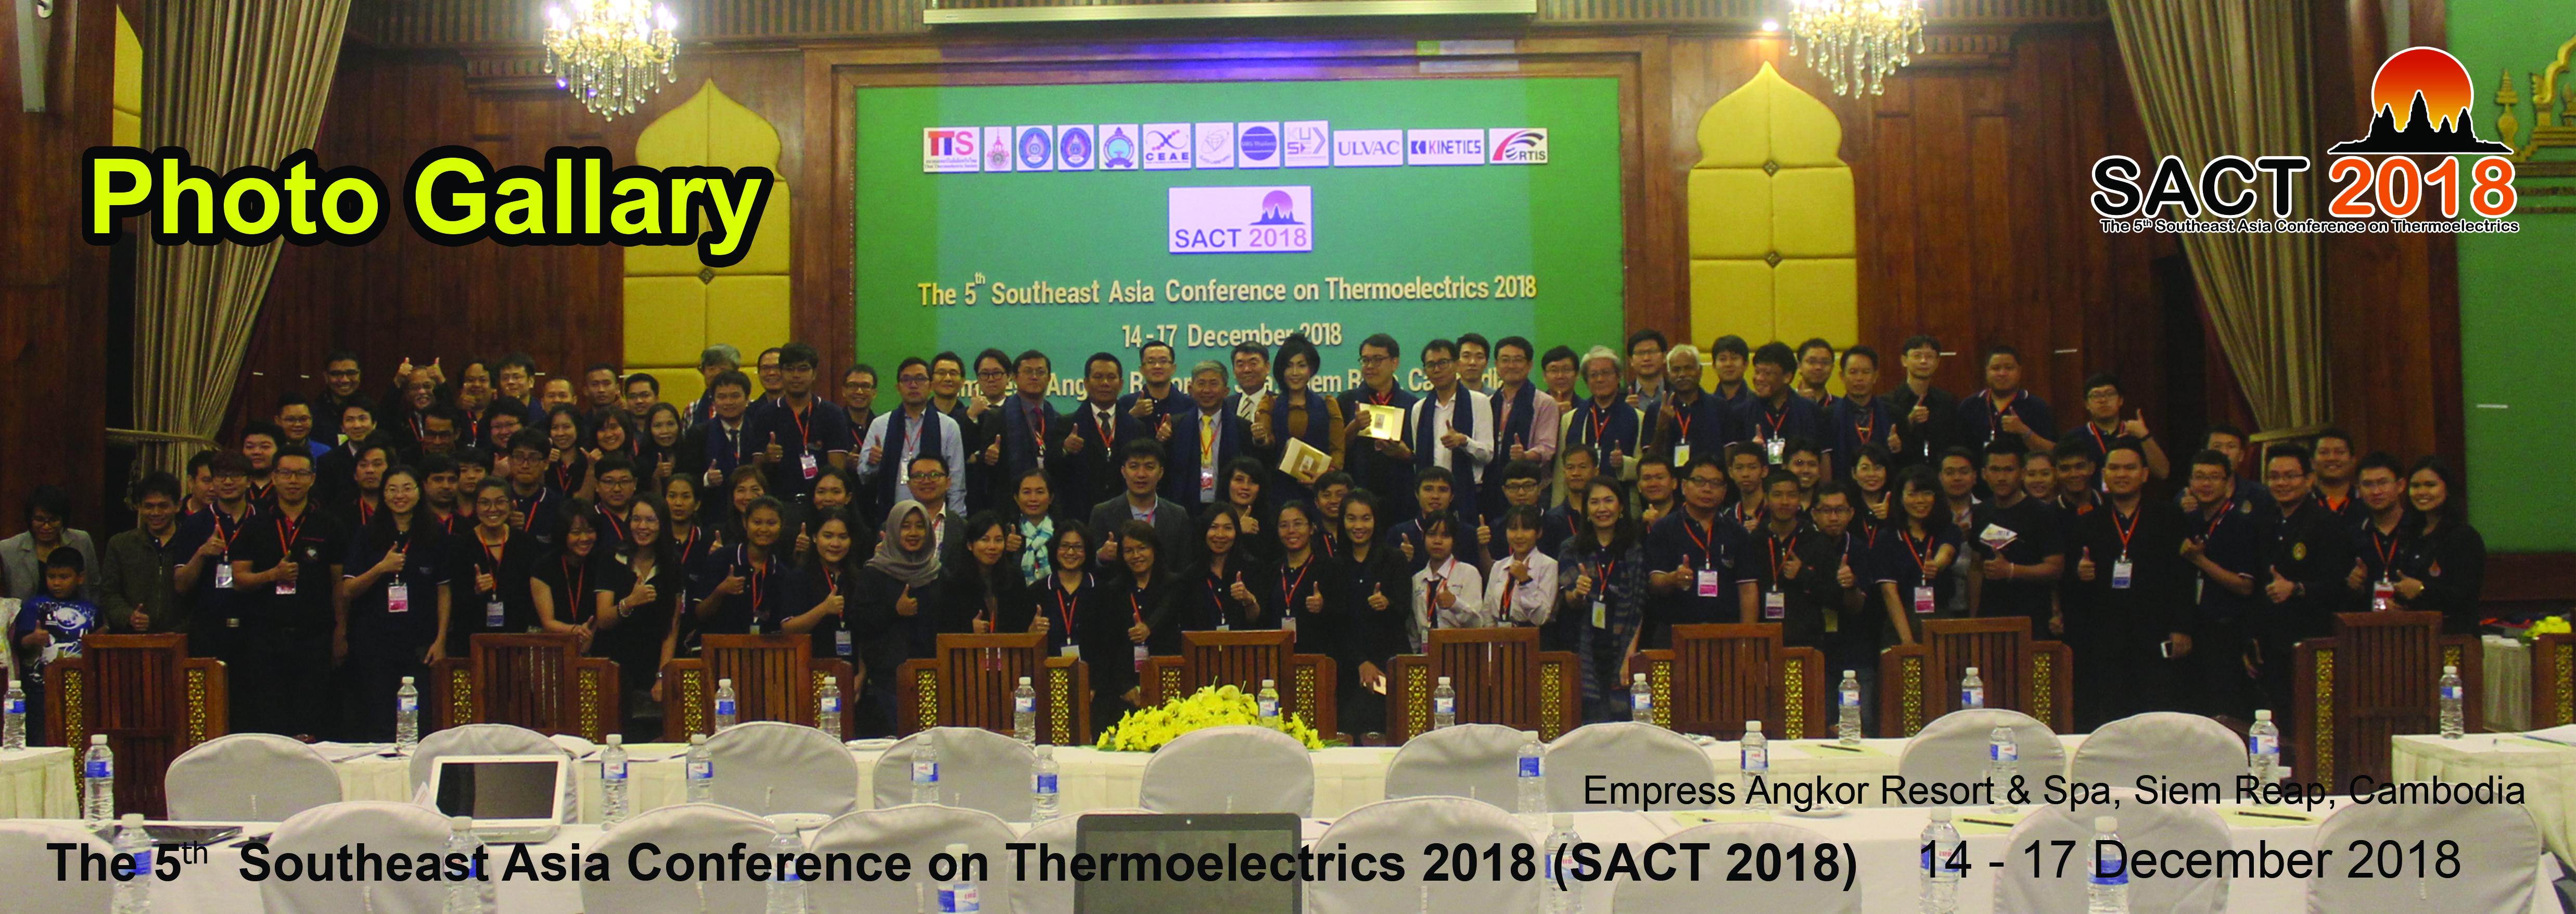 SACT2018 Photo Gallery